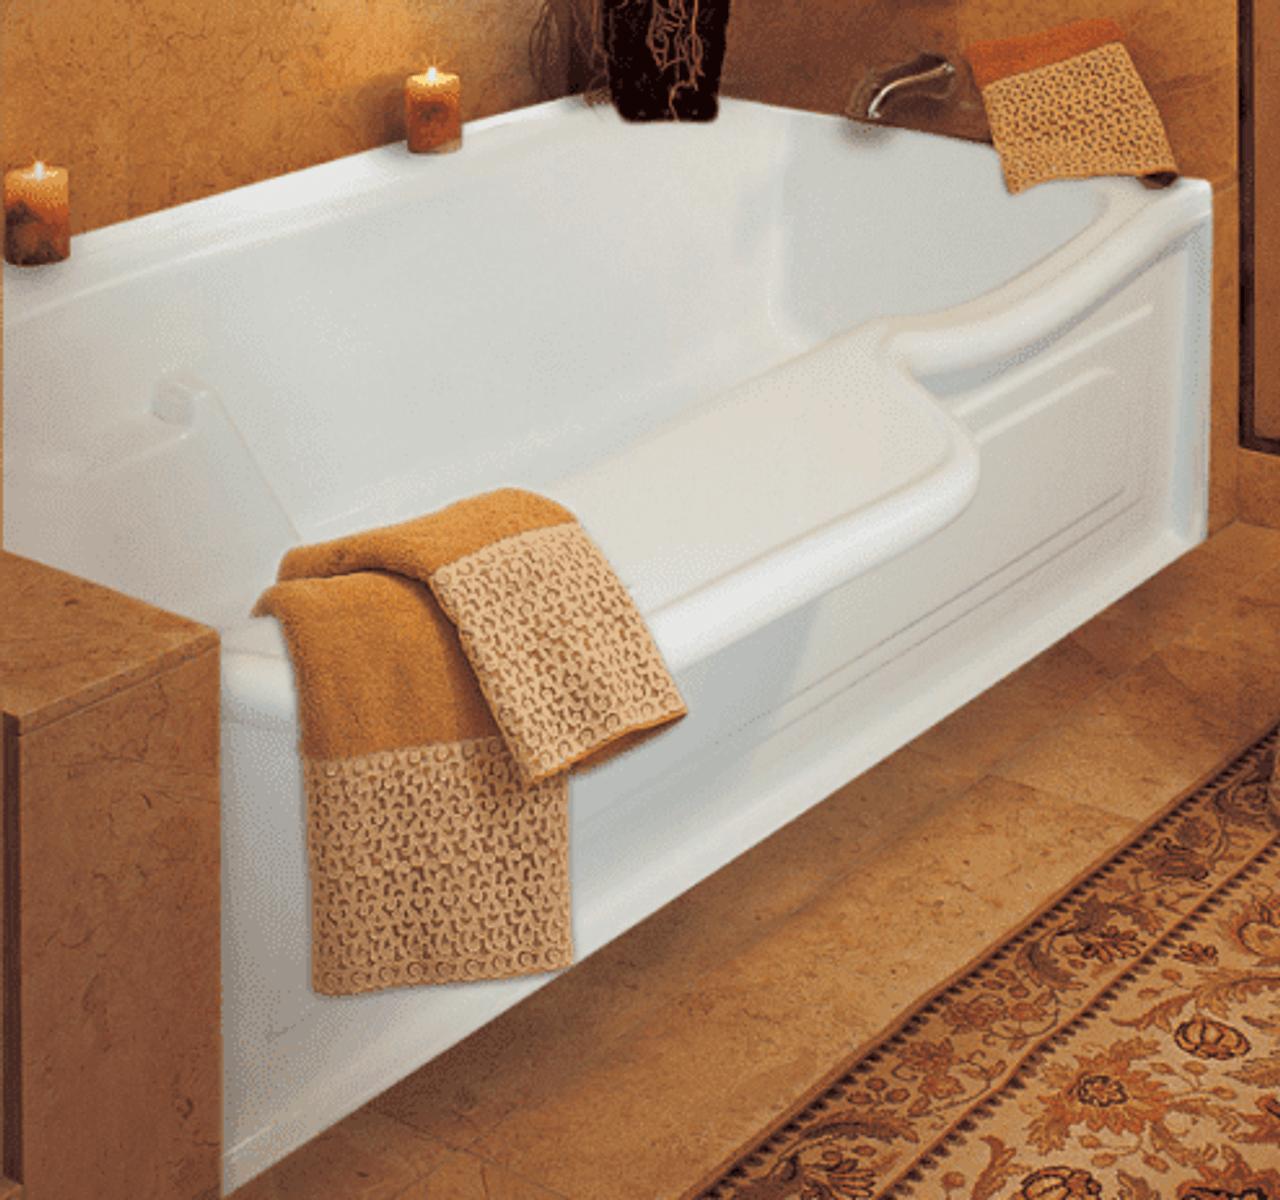 Newedge Bathtub Bathtub With Seat Built In The Edge